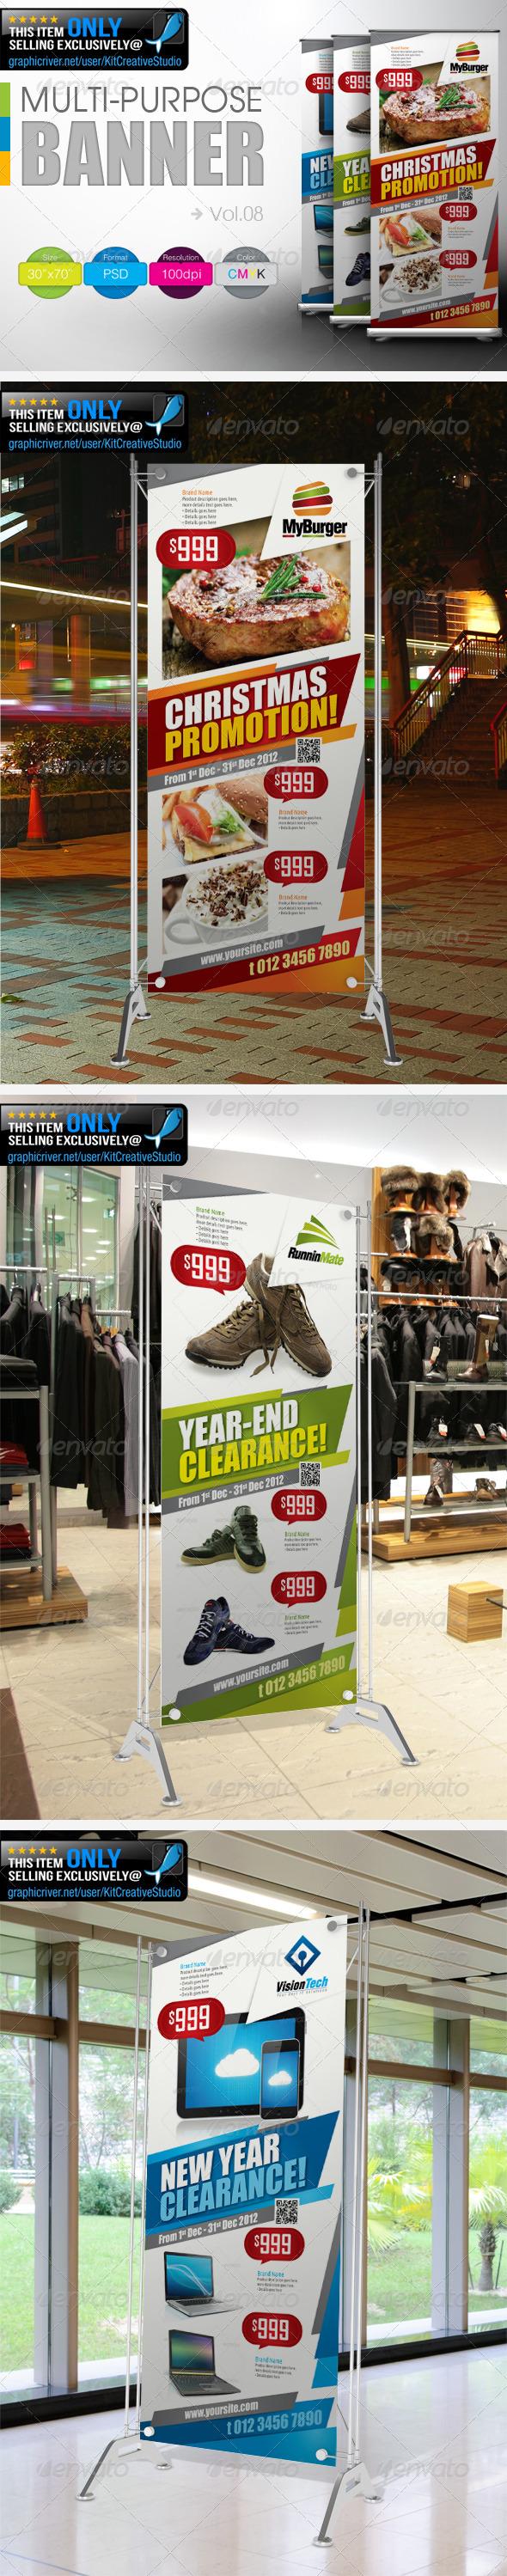 Multipurpose Promotional Banner Vol.8 - Signage Print Templates